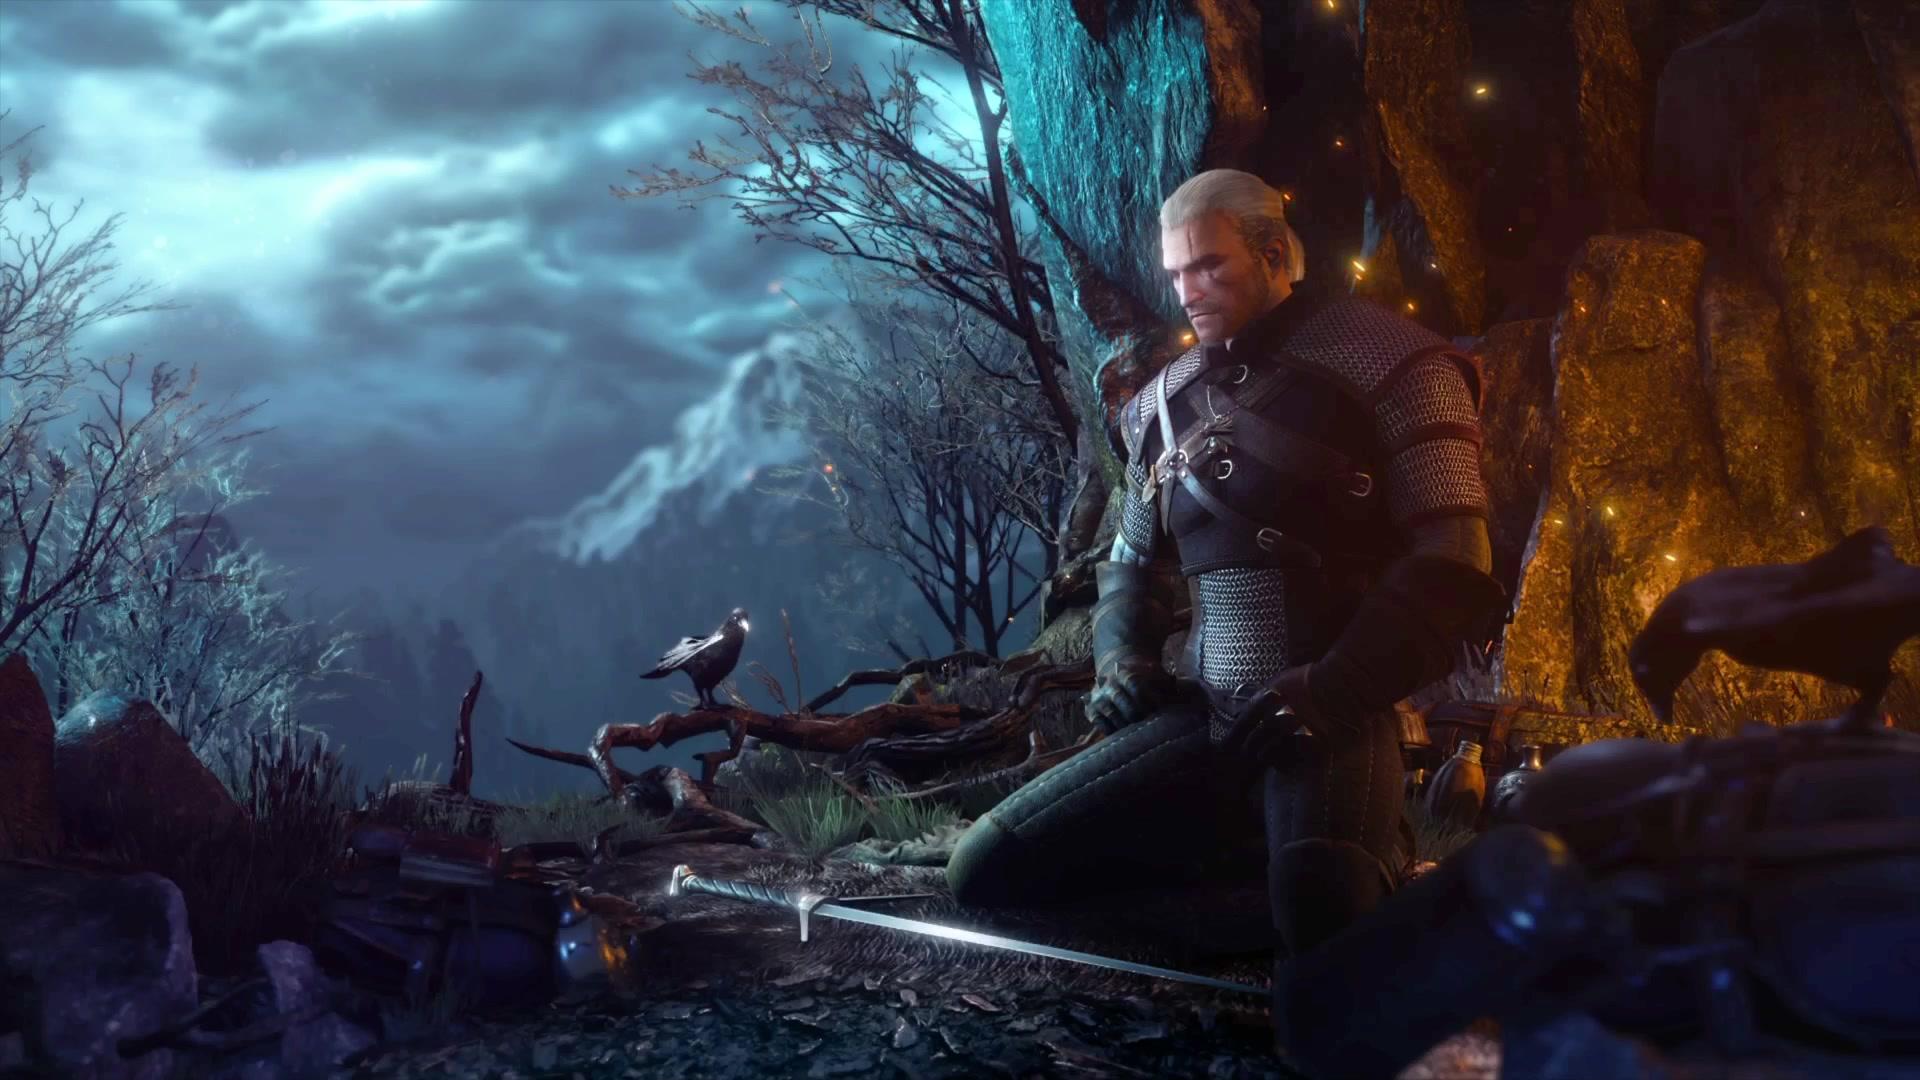 Ведьмак 3_ Дикая Охота_20180204161942 50.jpg - Witcher 3: Wild Hunt, the